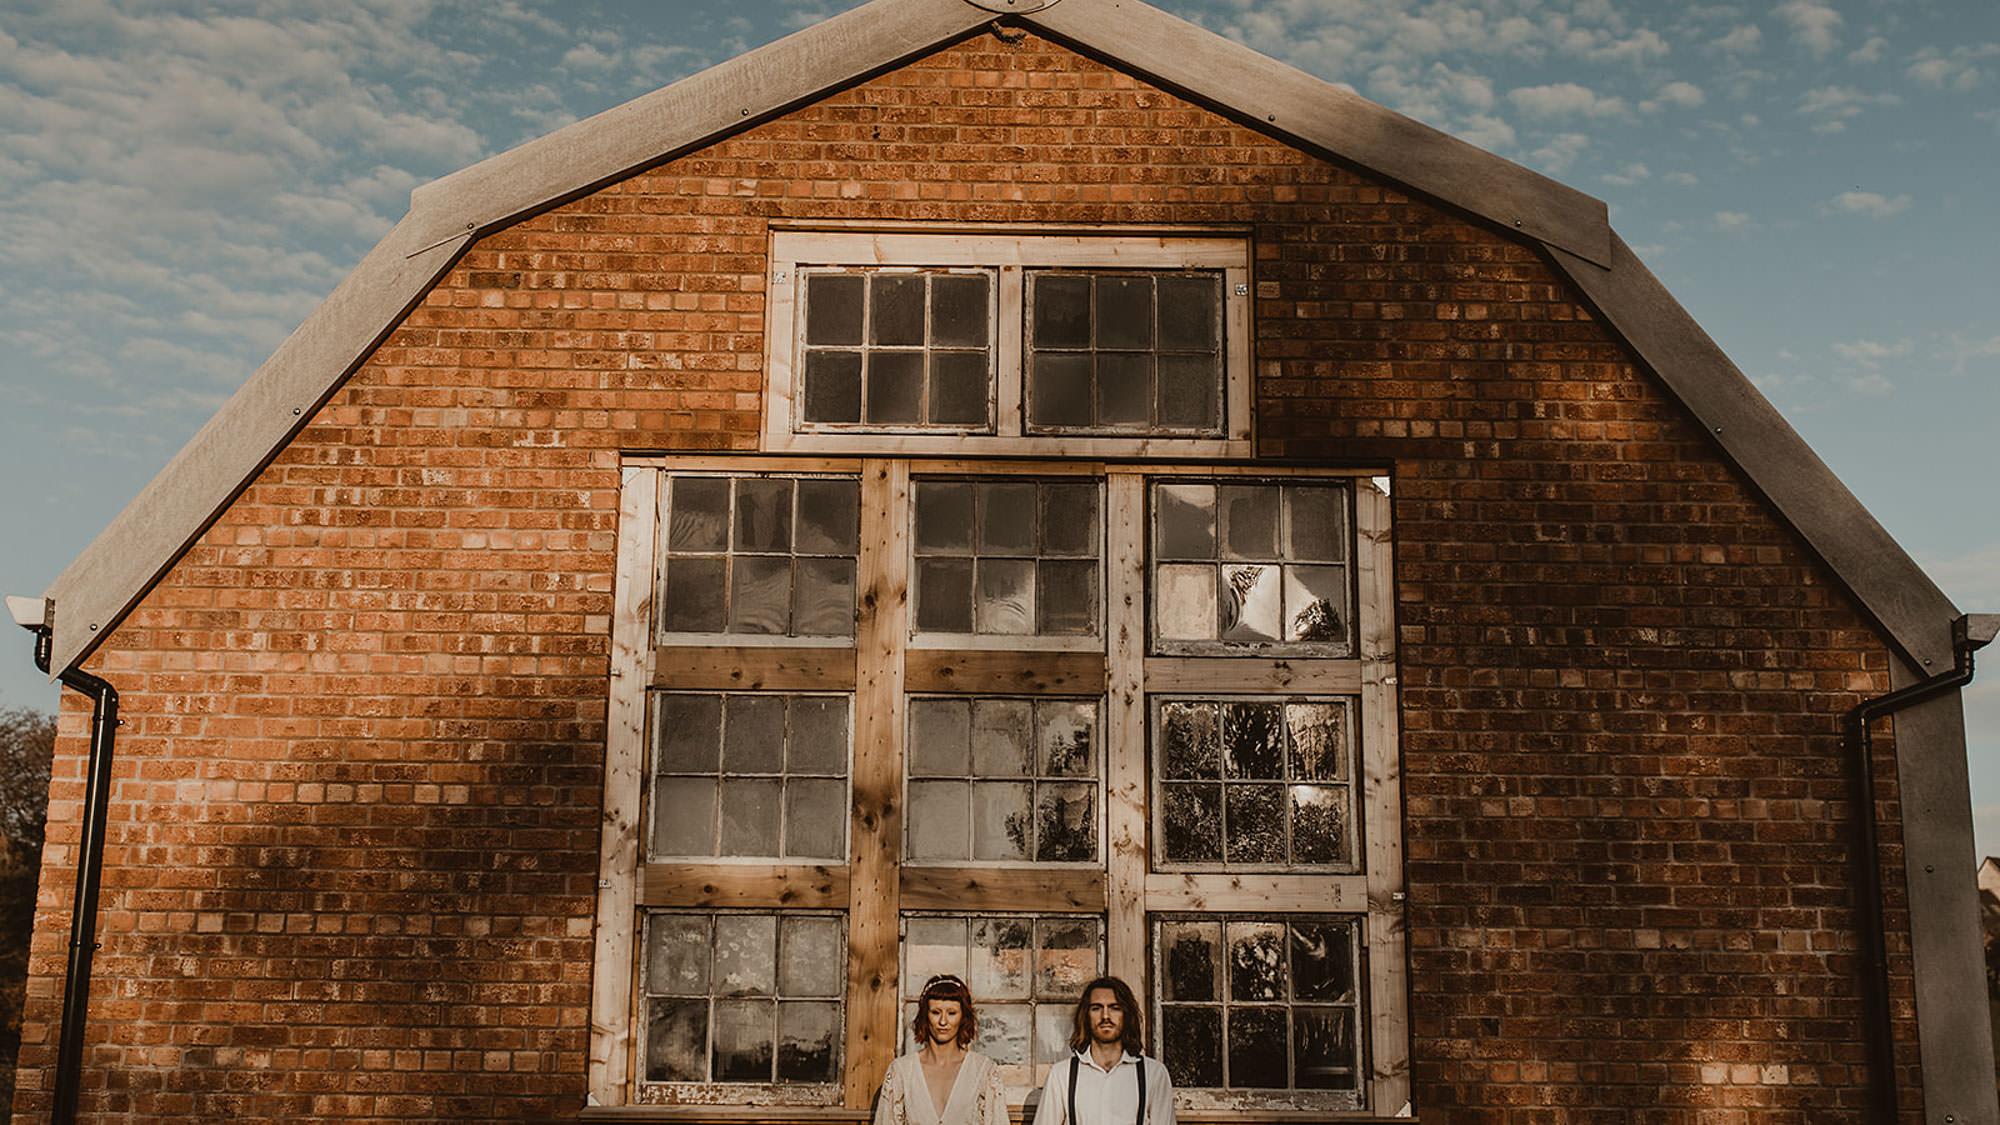 The Giraffe Shed Alternative Wedding Barn In Central Wales